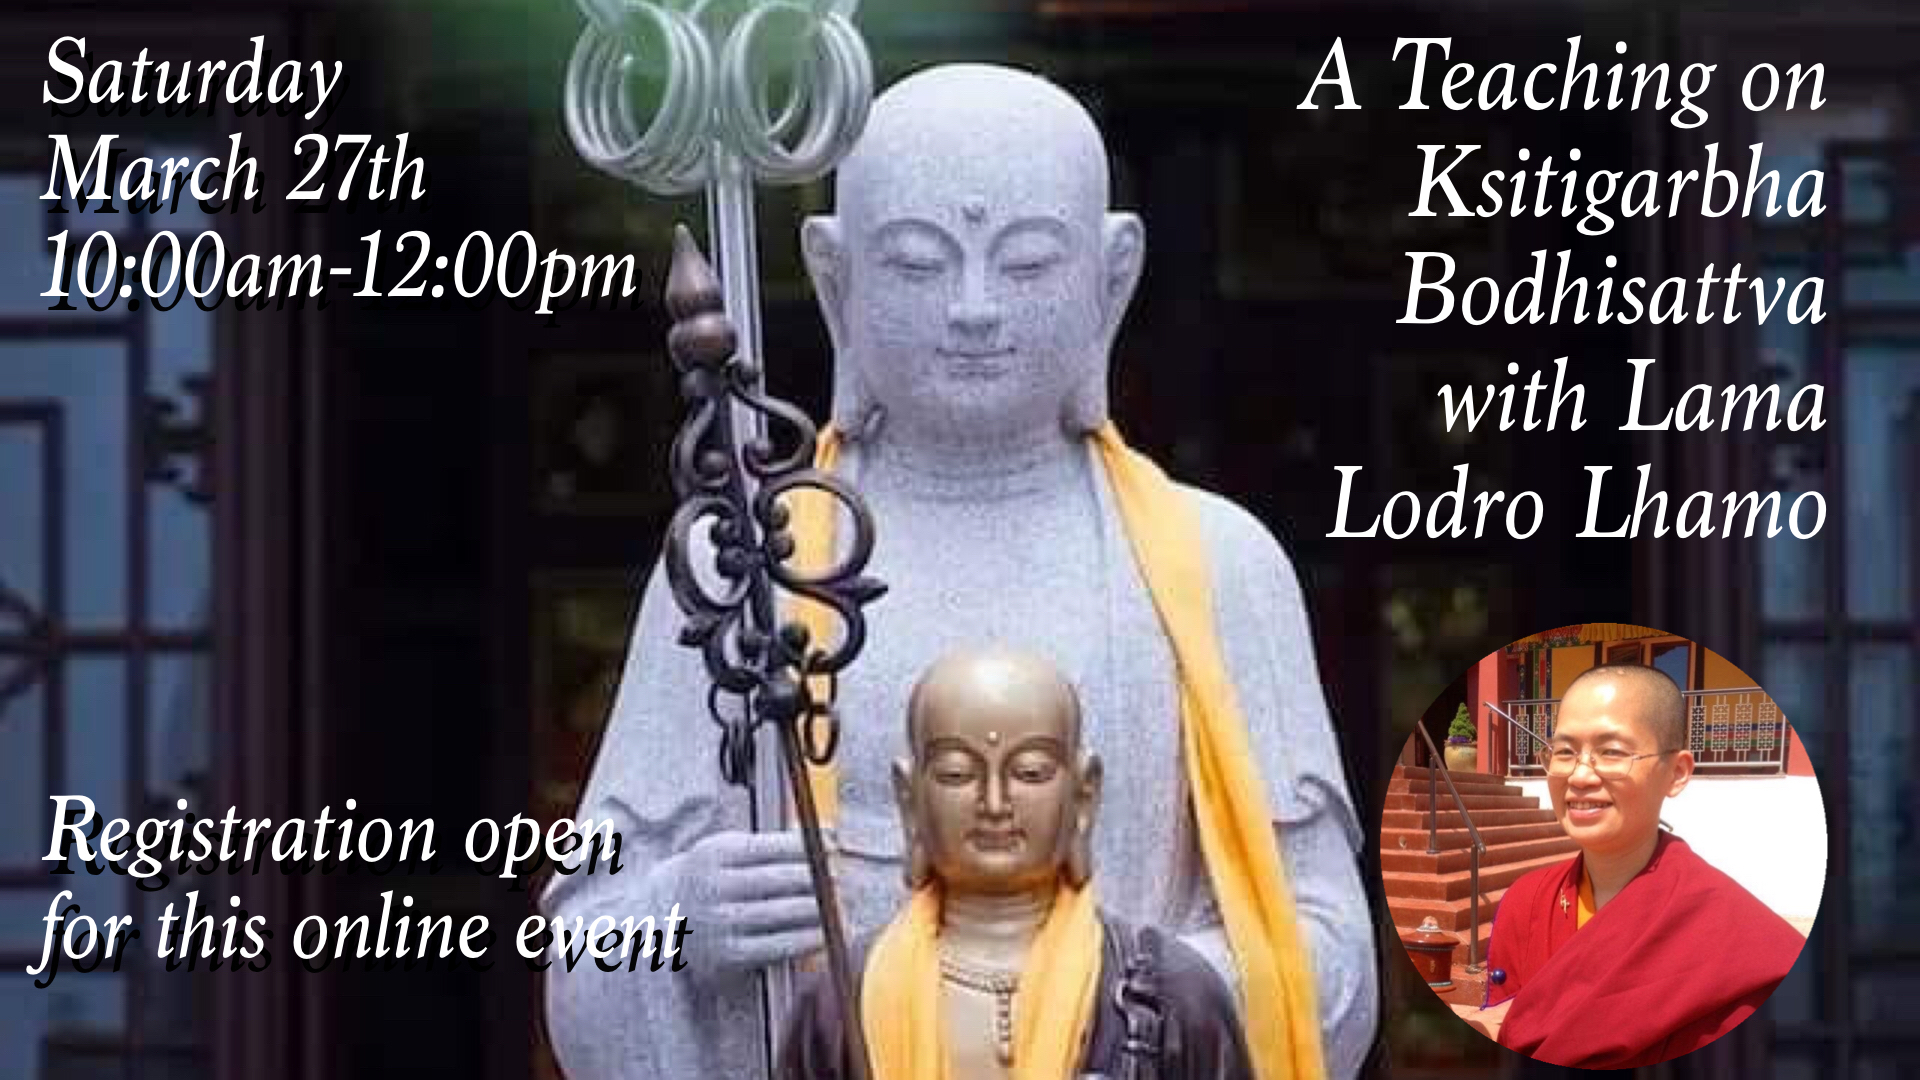 A Teaching on Ksitigarbha Bodhisattva with Lama Lodro Lhamo 3/27